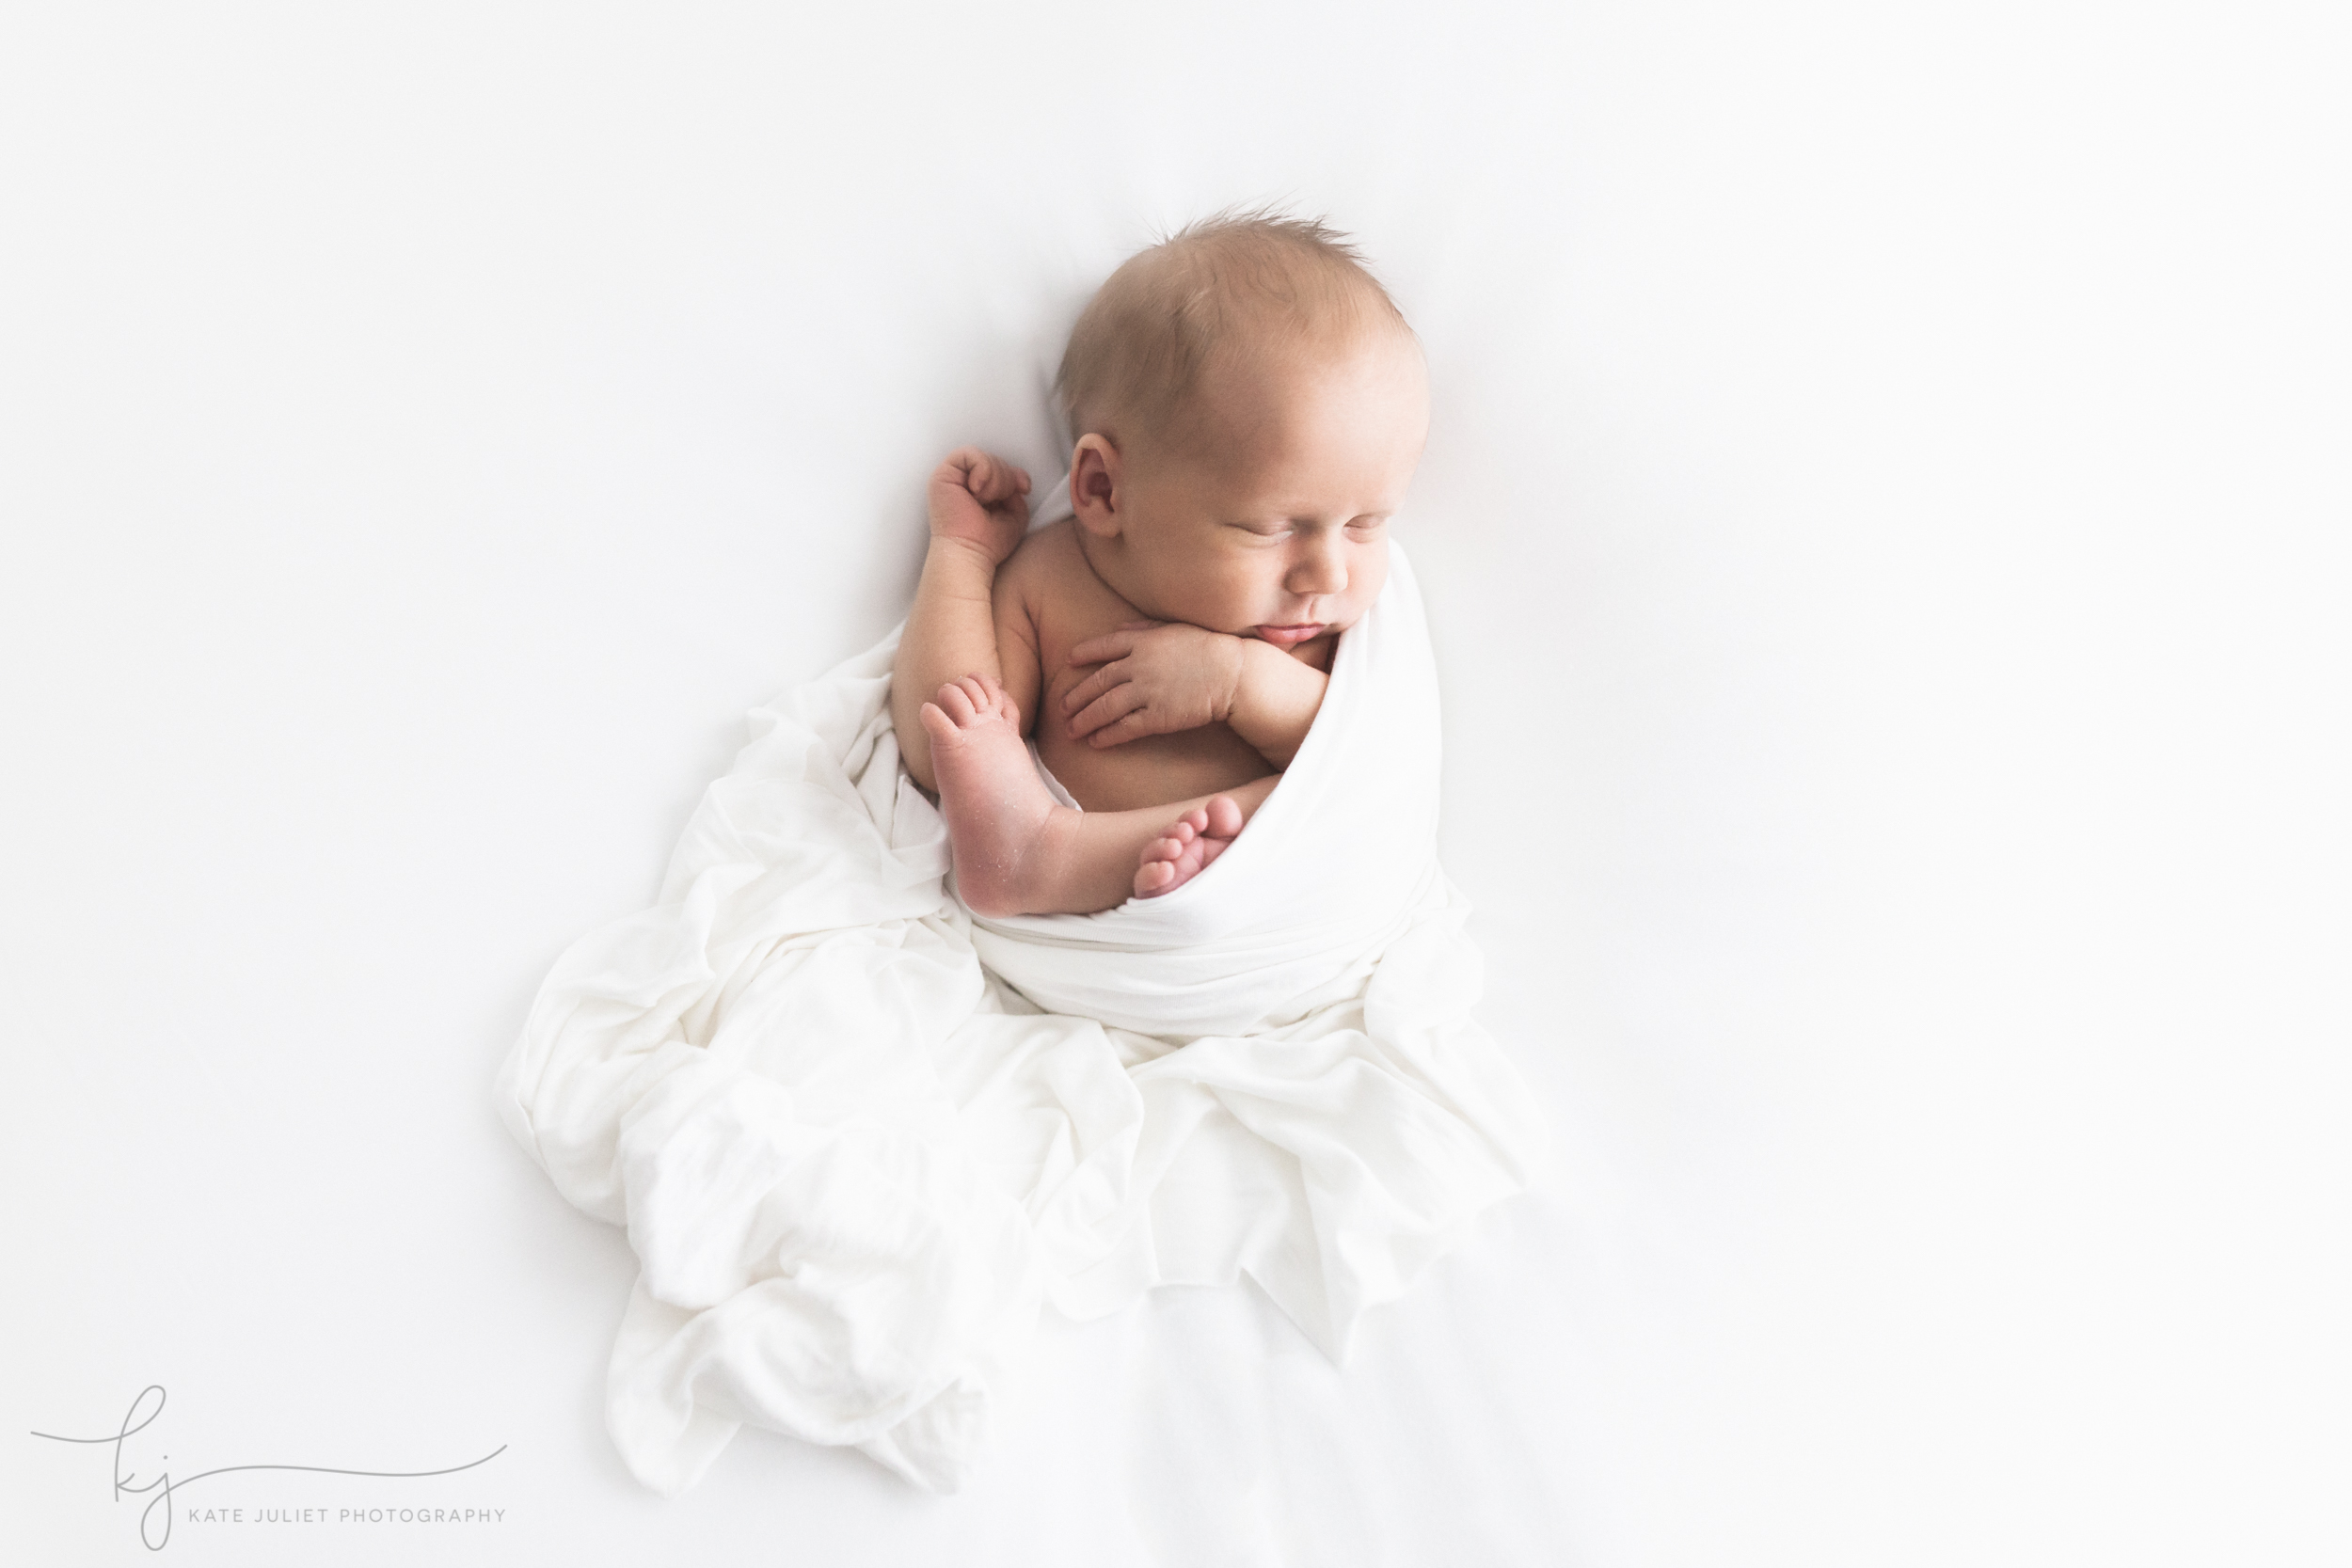 Arlington VA Fine Art Natural Newborn Photographer | Kate Juliet Photography